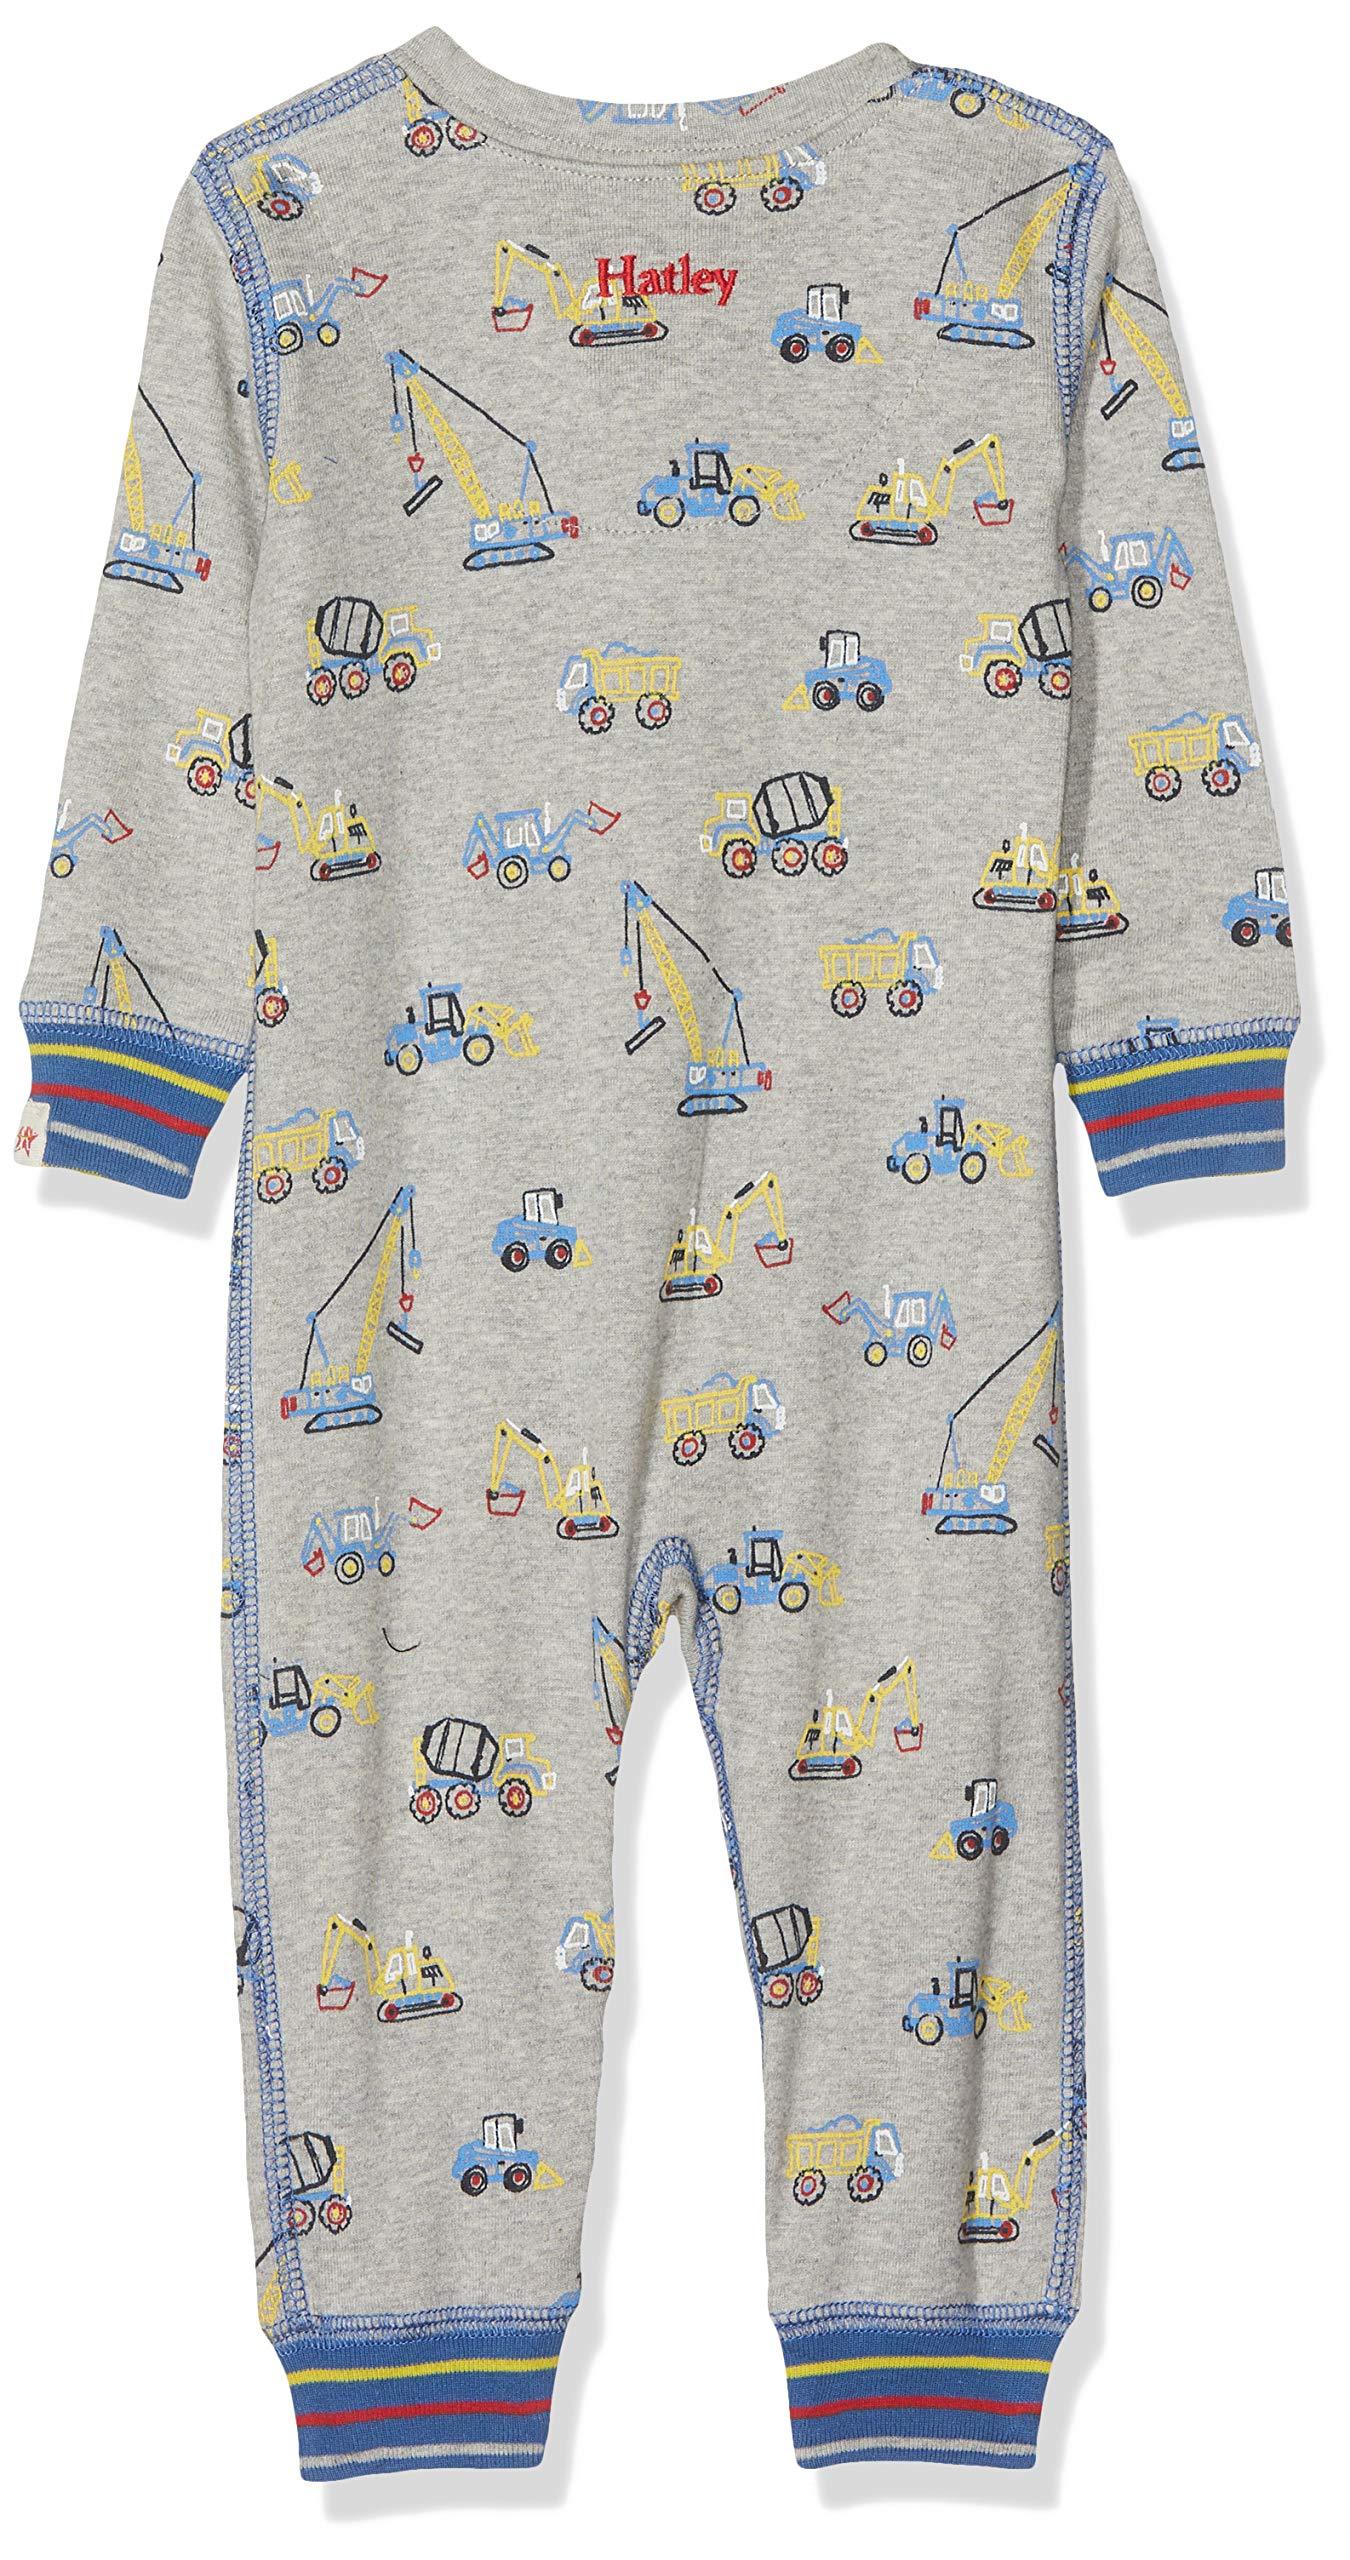 Hatley Organic Cotton Sleepsuit Pelele para Dormir para Bebés 2